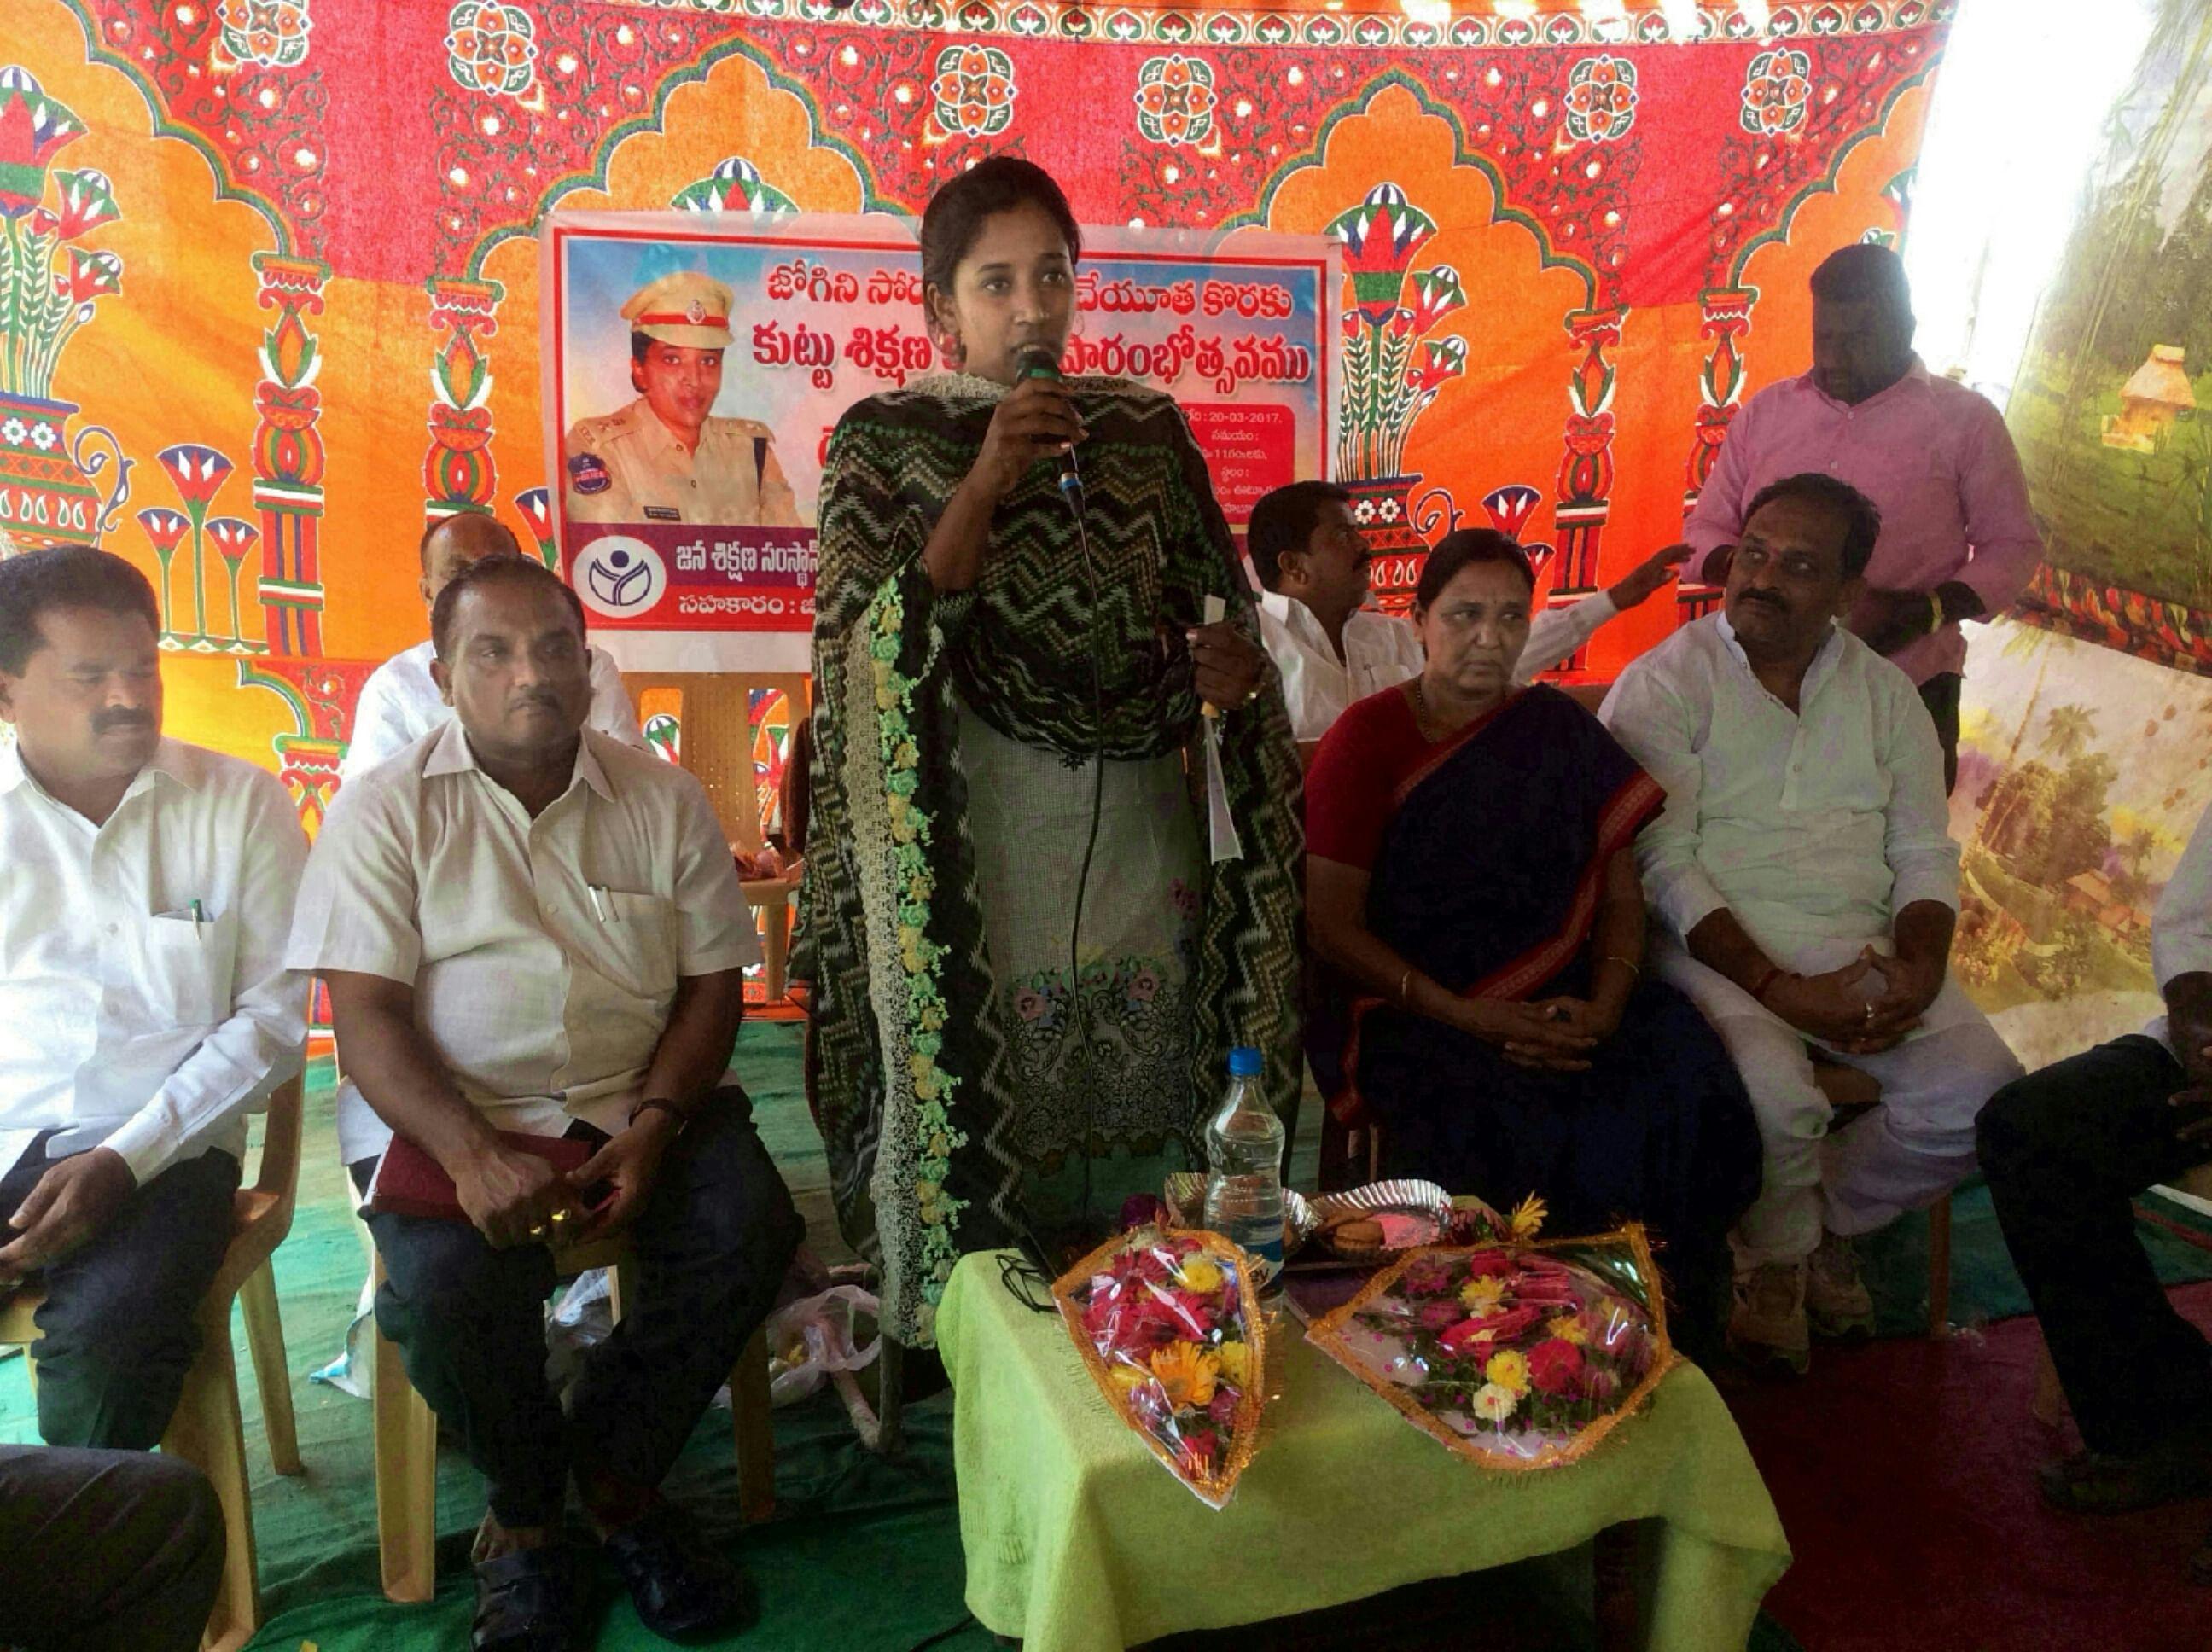 IPS Rema Rajeshwari police officer